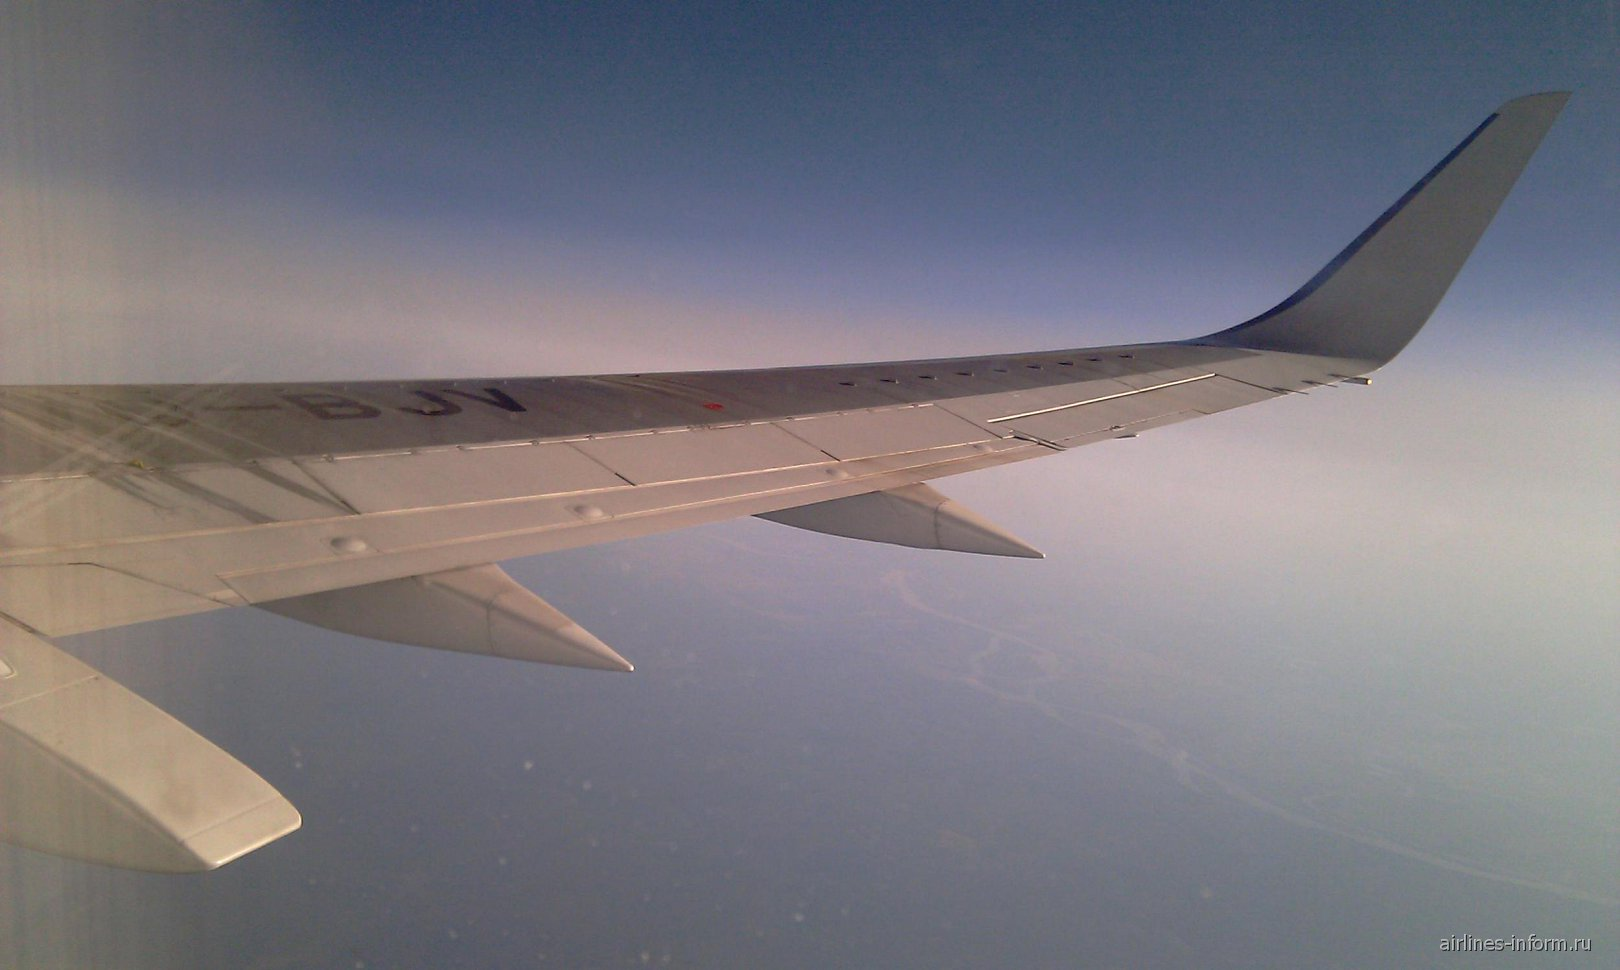 Рейс Красноярск-Екатеринбург авиакомпании ЮТэйр